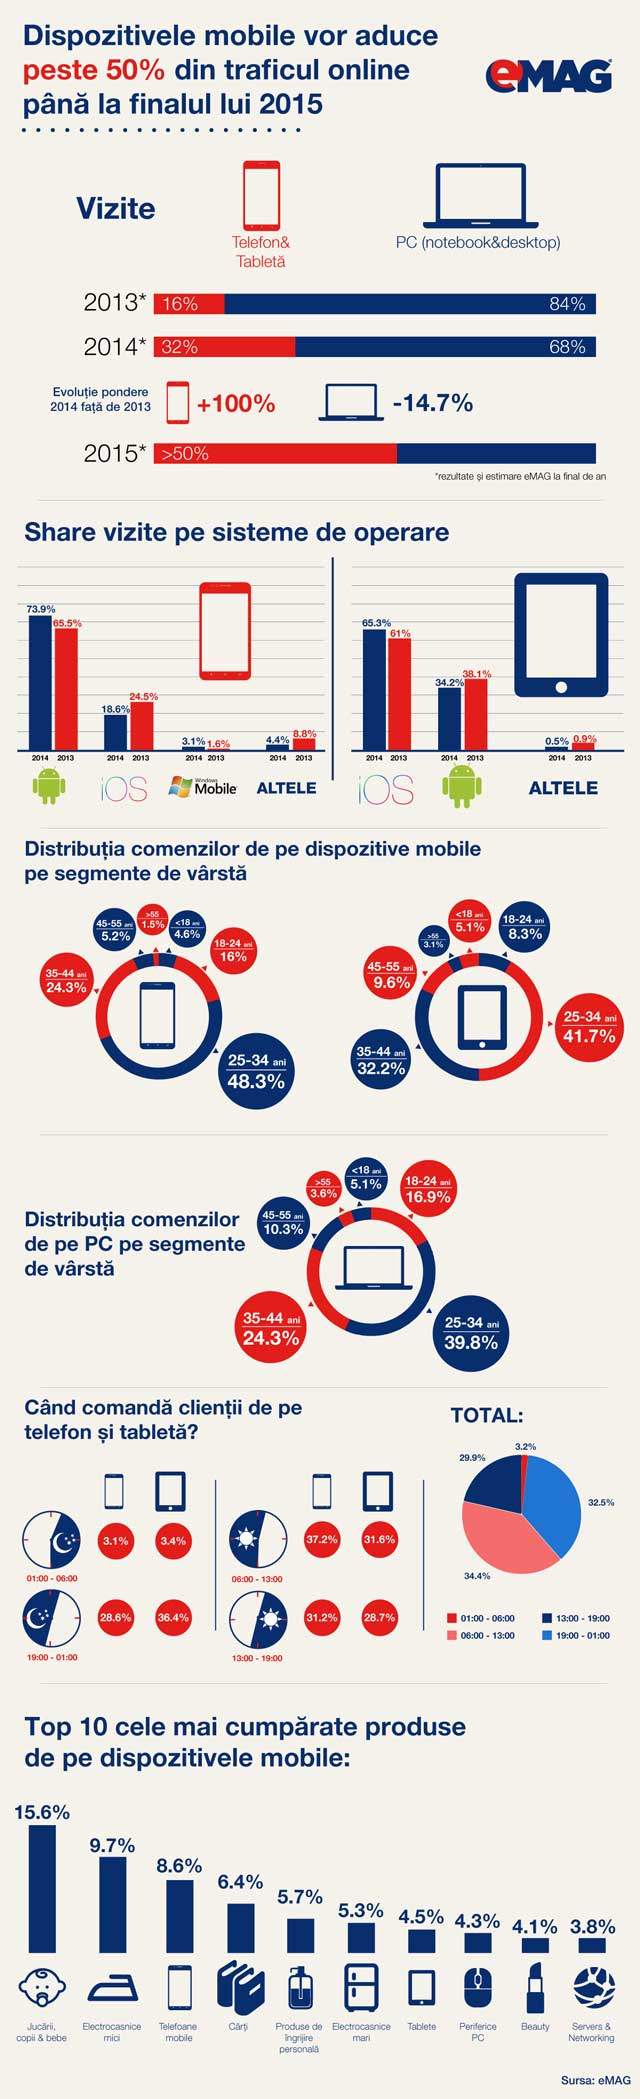 Infografic-eMAG_Dispozitive_mobile